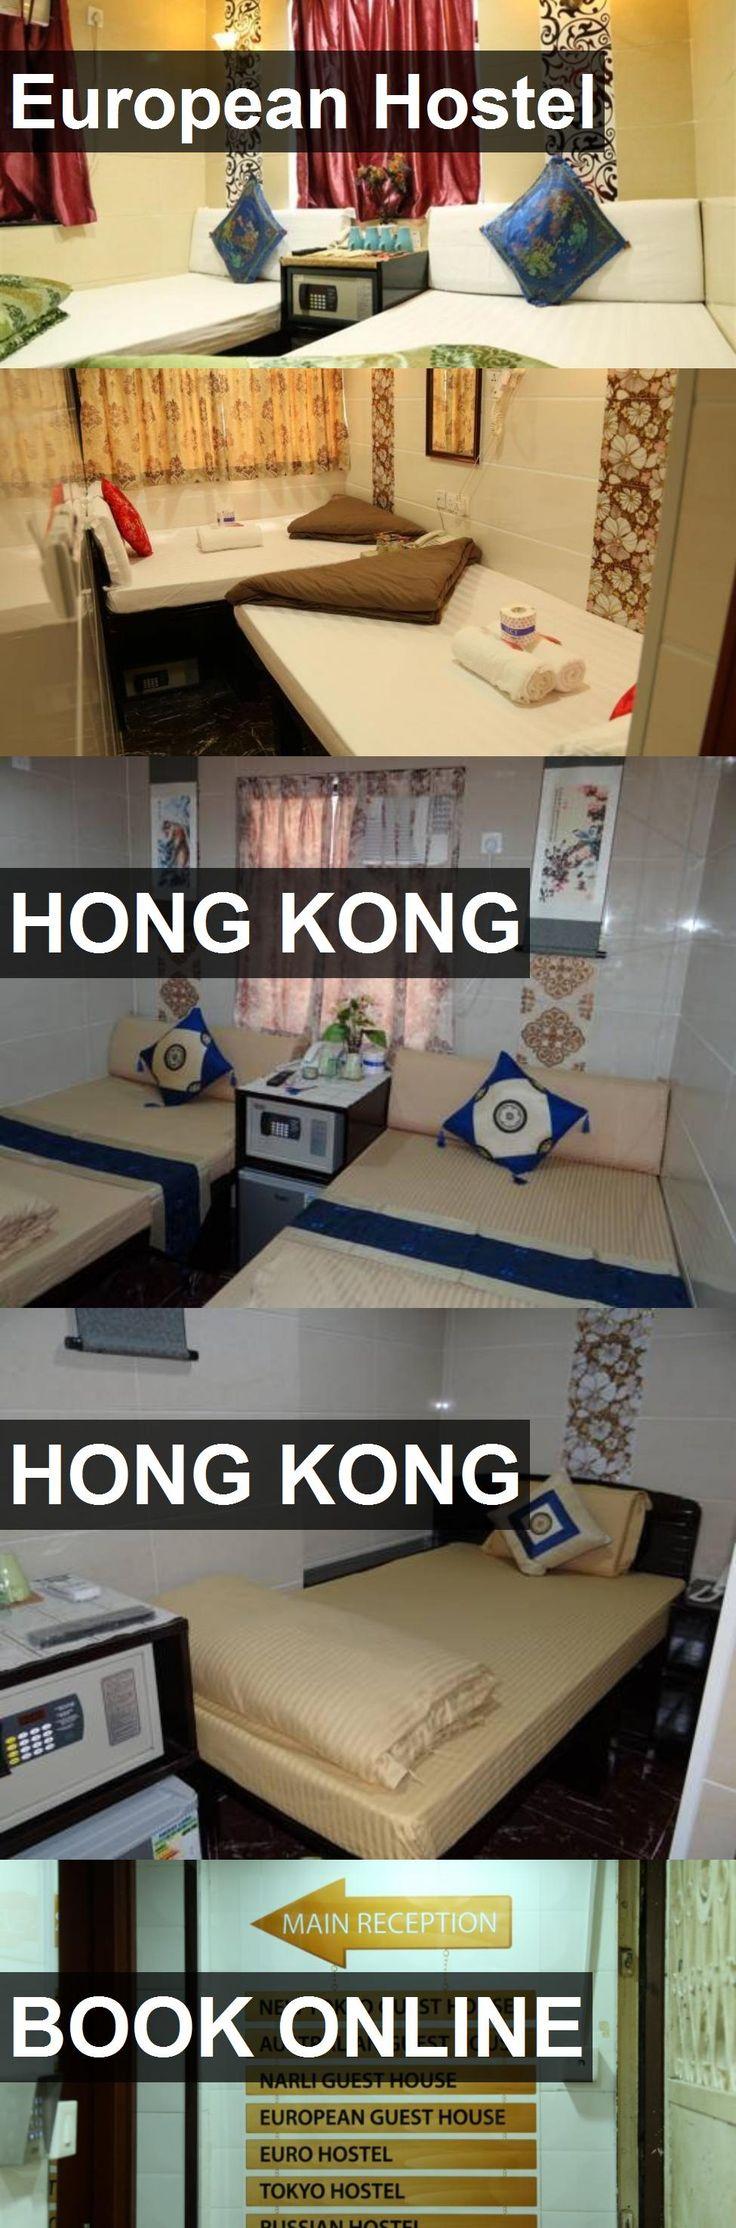 European Hostel in Hong Kong, Hong Kong. For more information, photos, reviews and best prices please follow the link. #HongKong #HongKong #travel #vacation #hostel